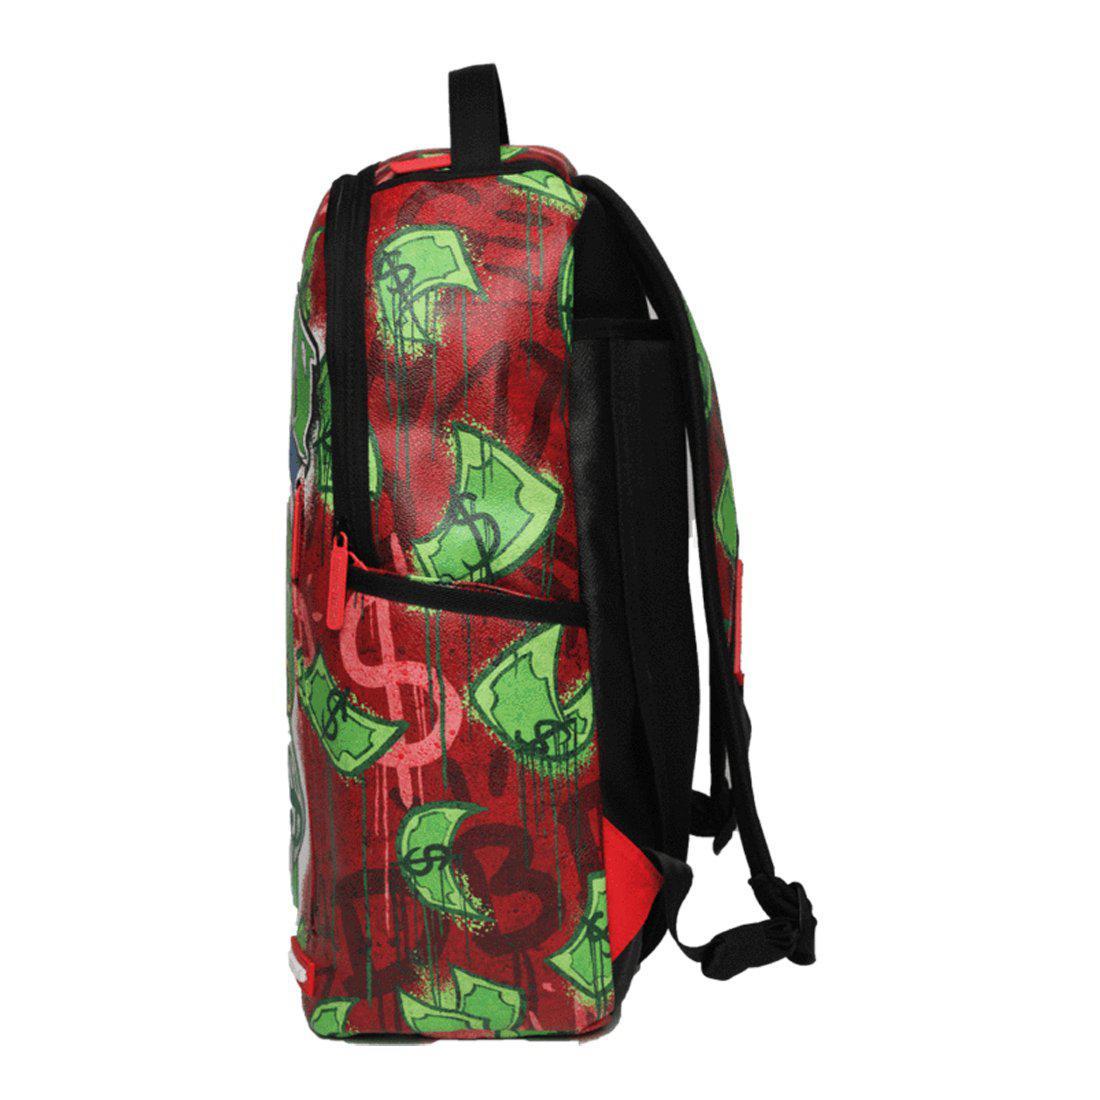 Sprayground Money Bear Raining Money Backpack